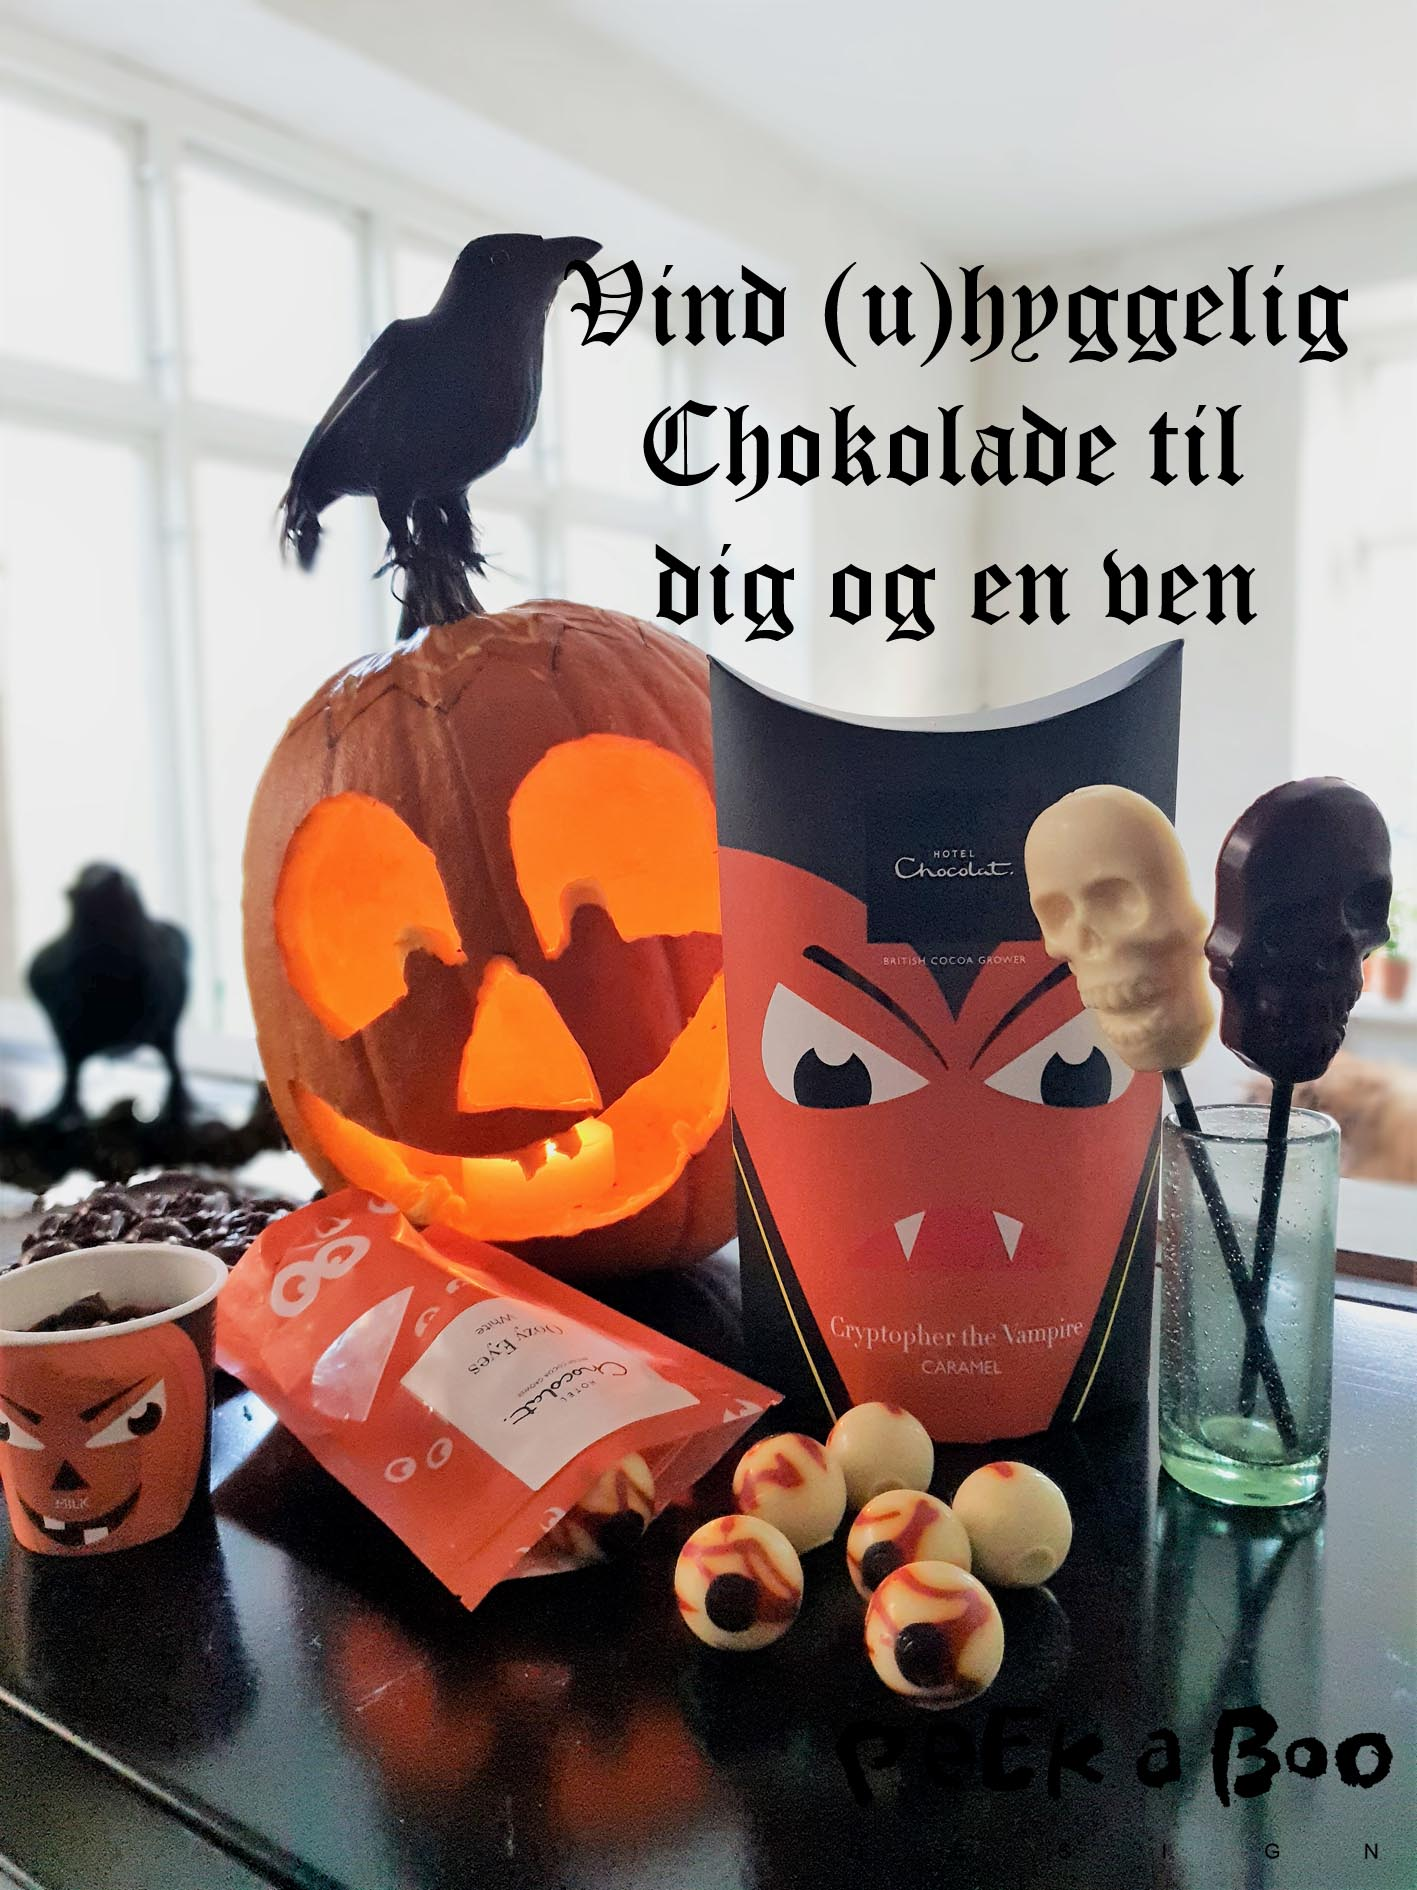 Halloween konkurrence med Chokolade fra Hotel Chocolat